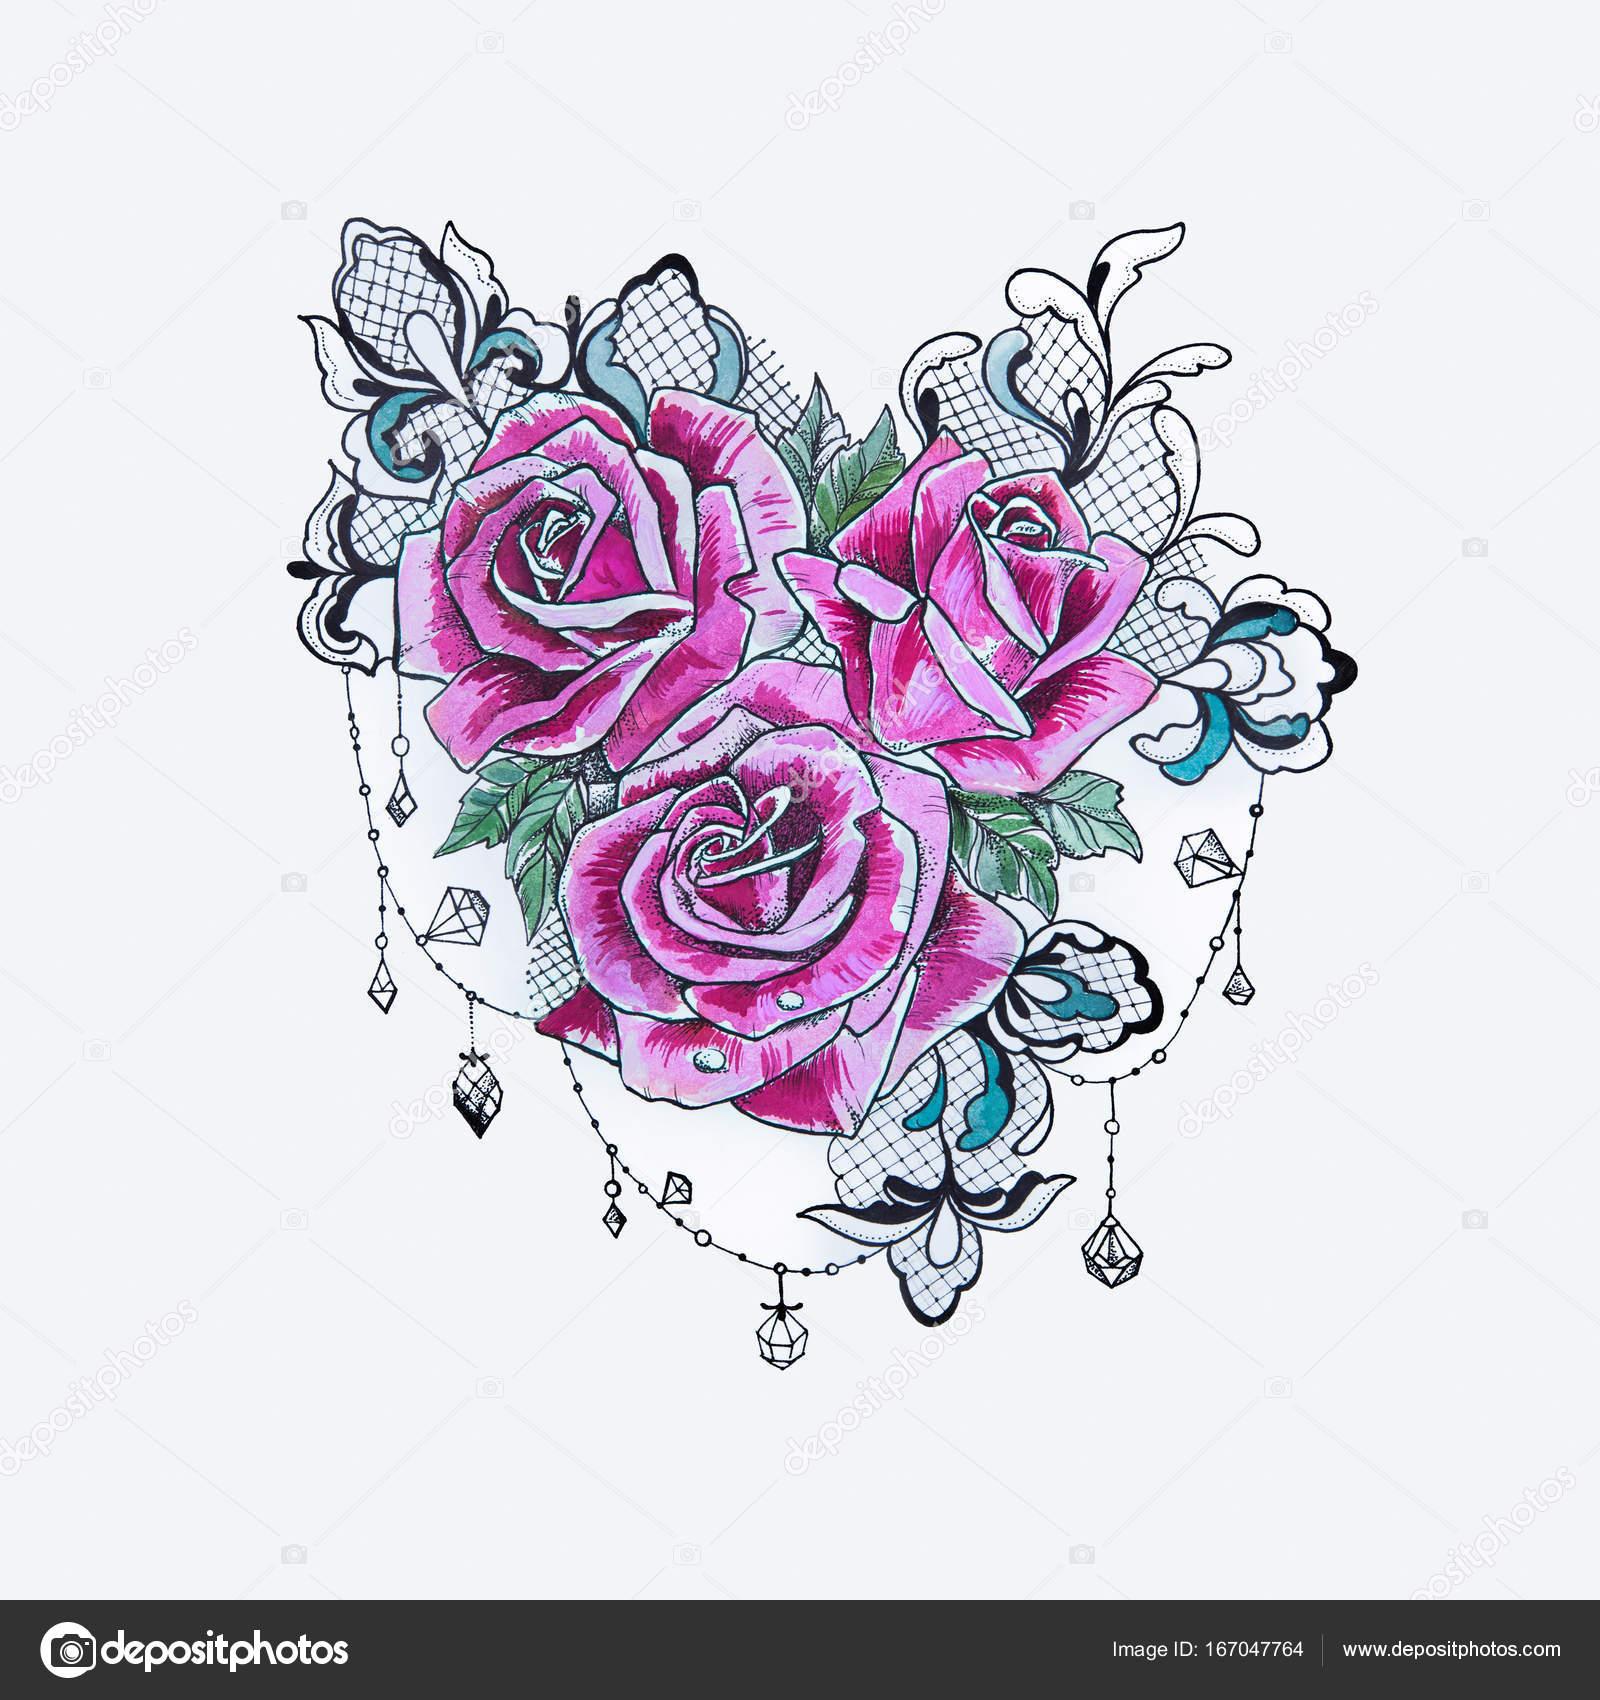 un dibujo de un hermoso ramo de rosas de color púrpura sobre un